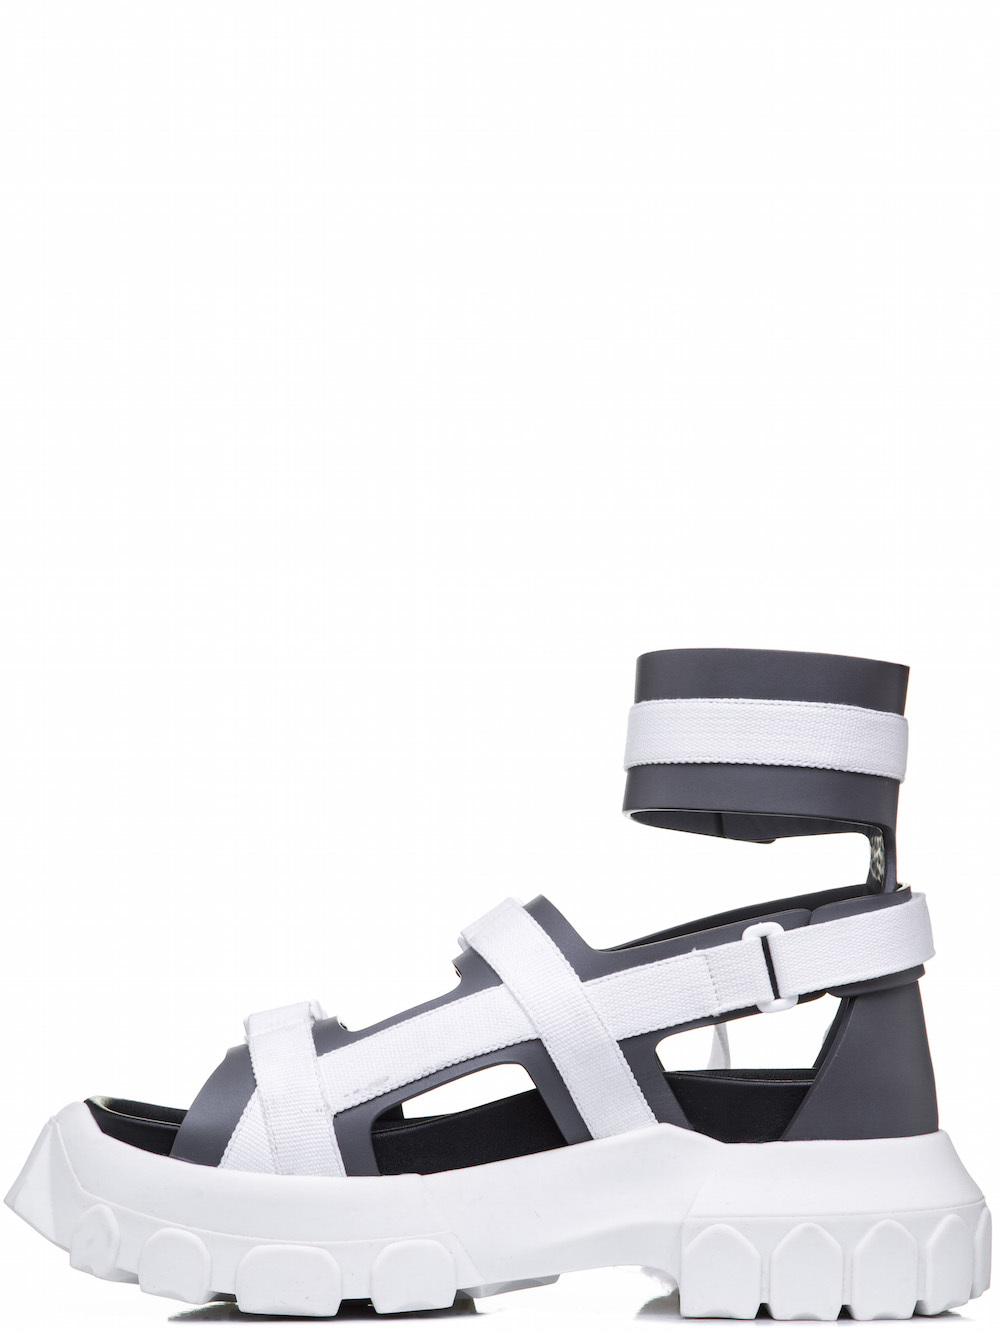 Rick OwensHiking Sandals